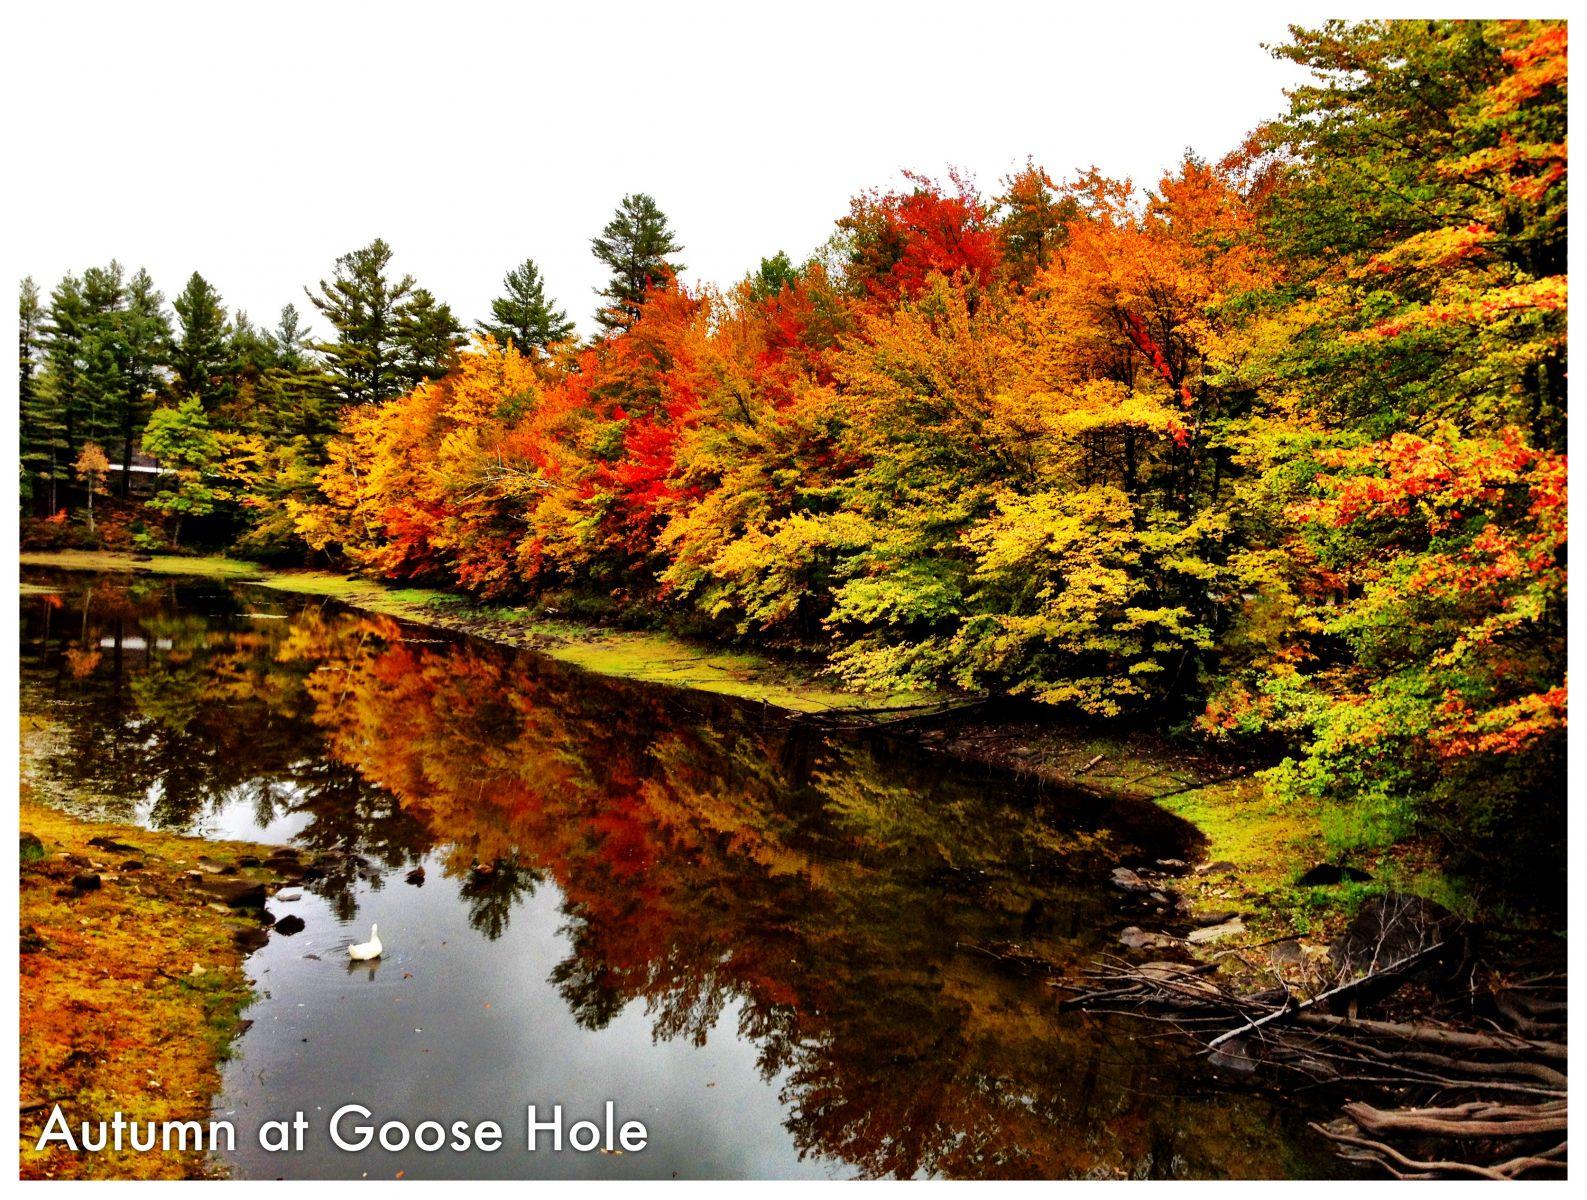 Autumn at Goose Hole